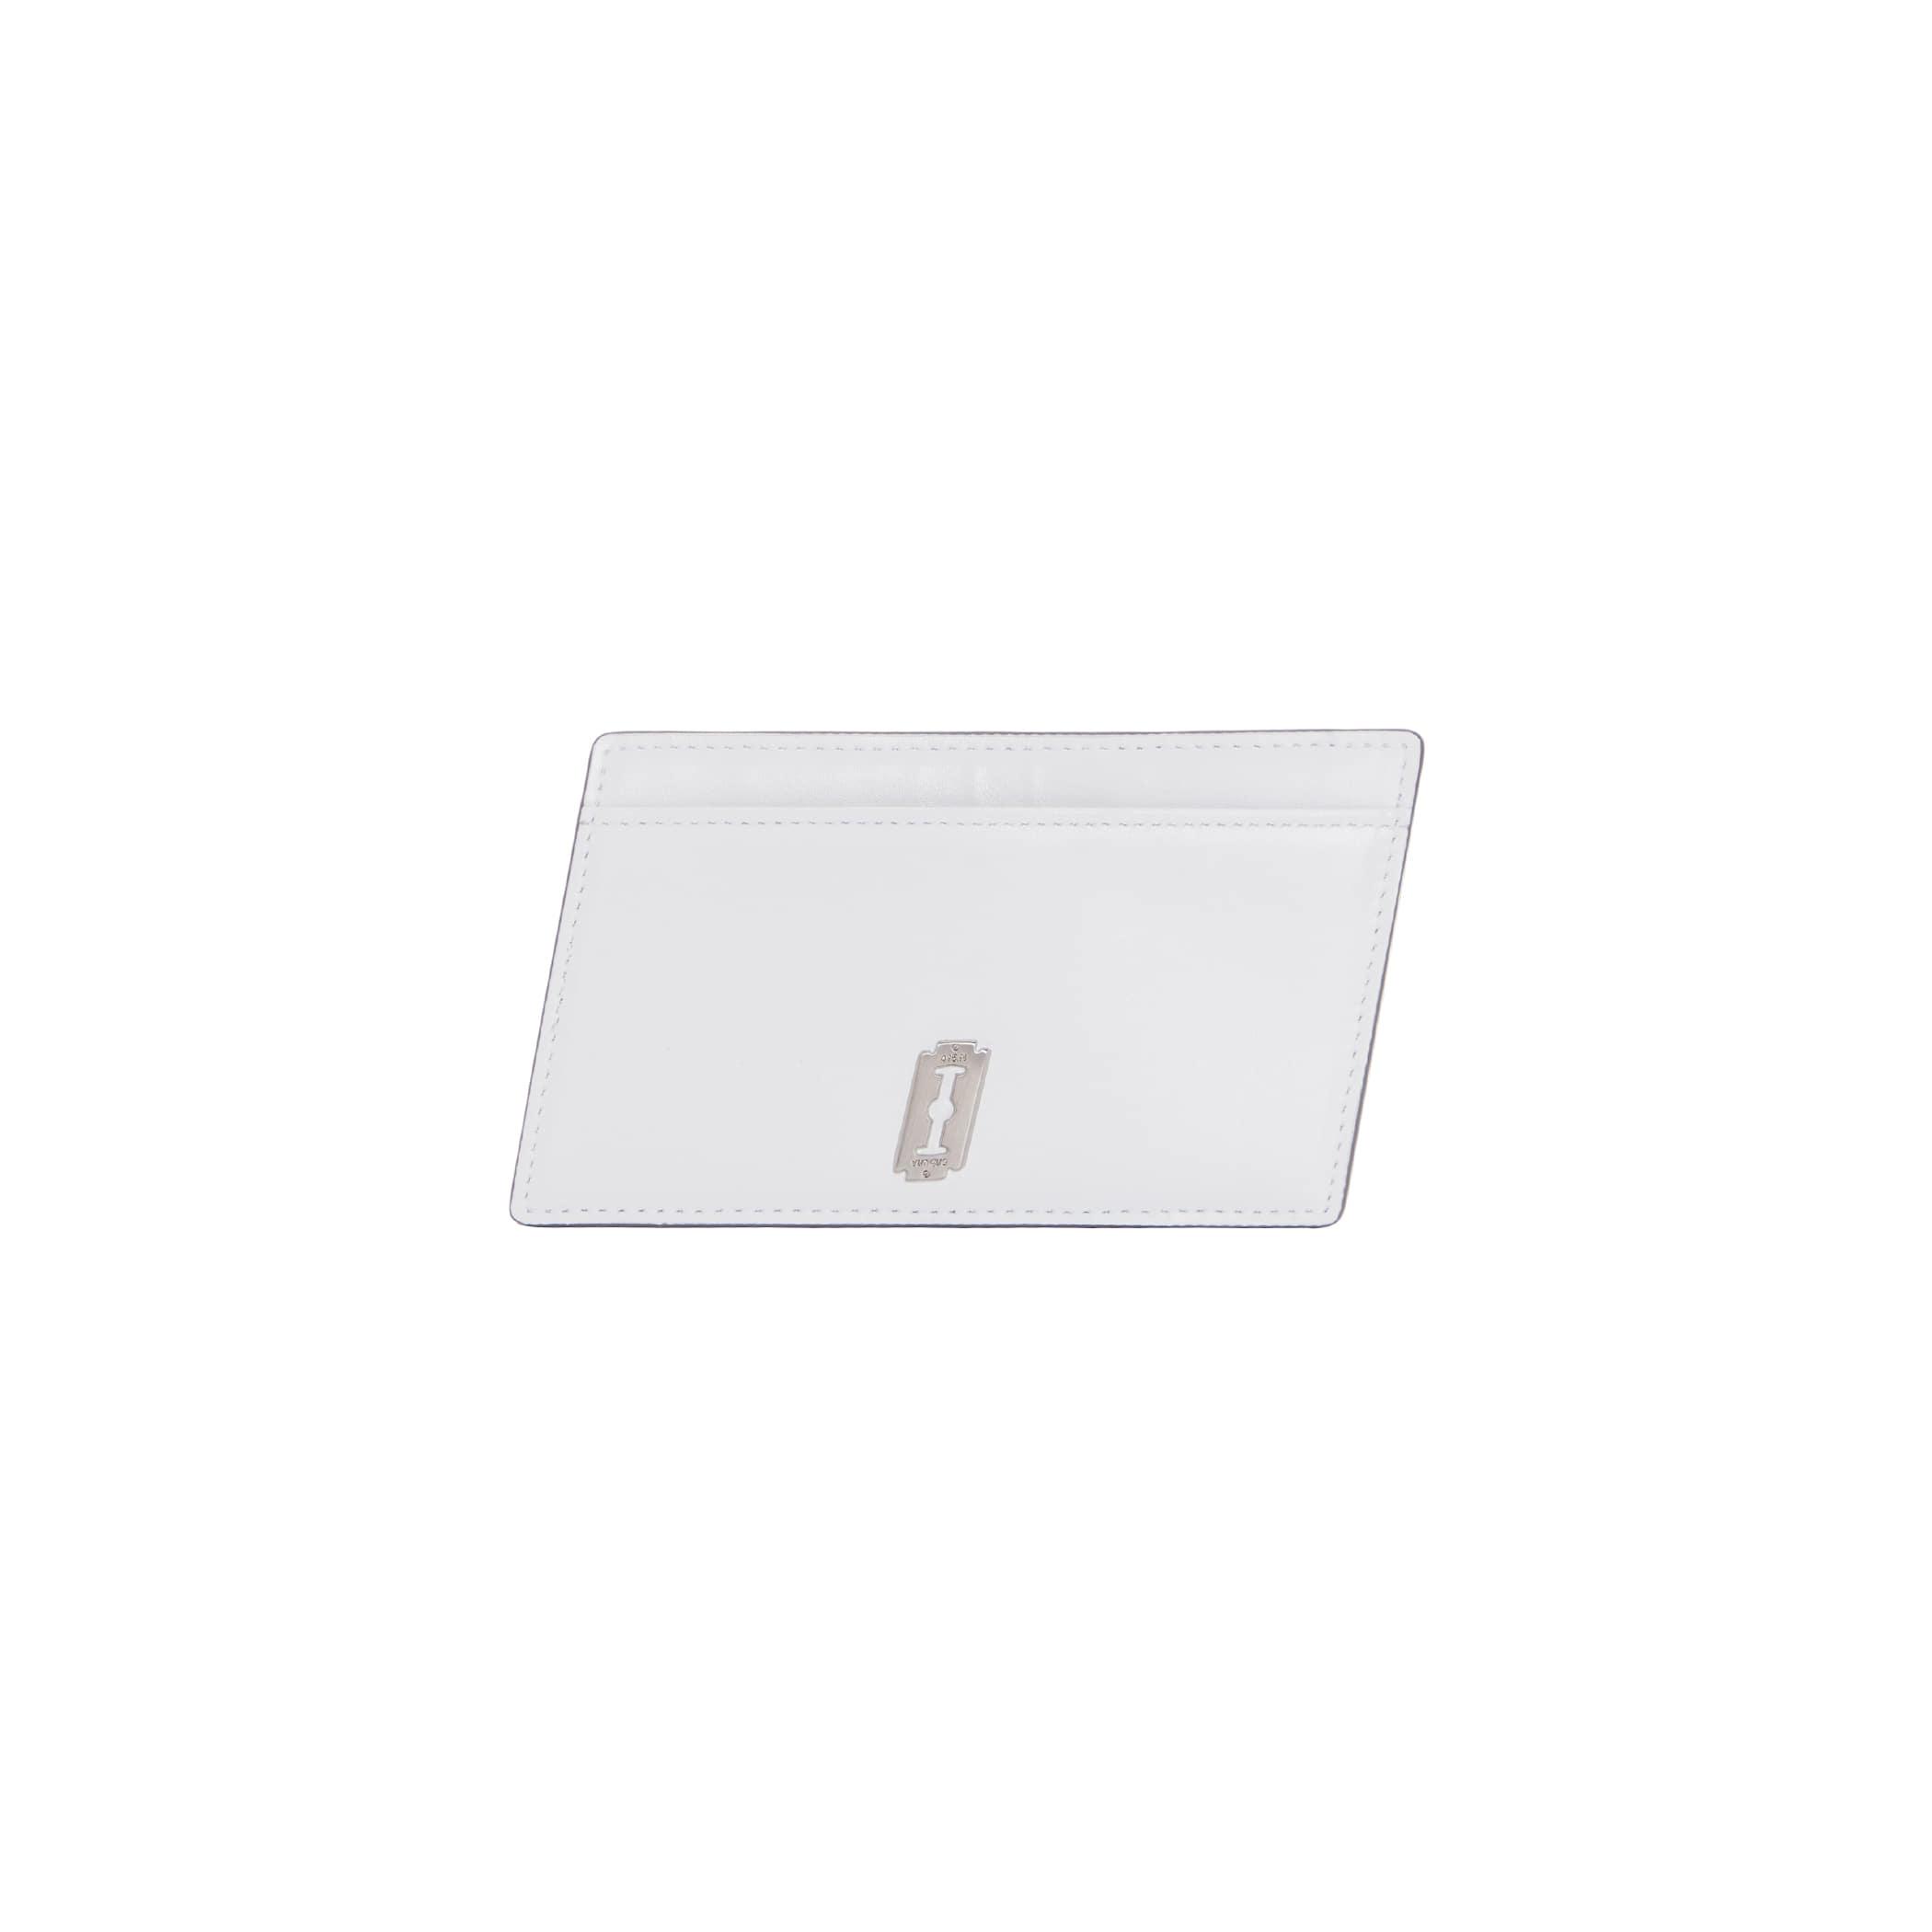 Mercury Square Card Holder (머큐리 스퀘어 카드홀더) Off White